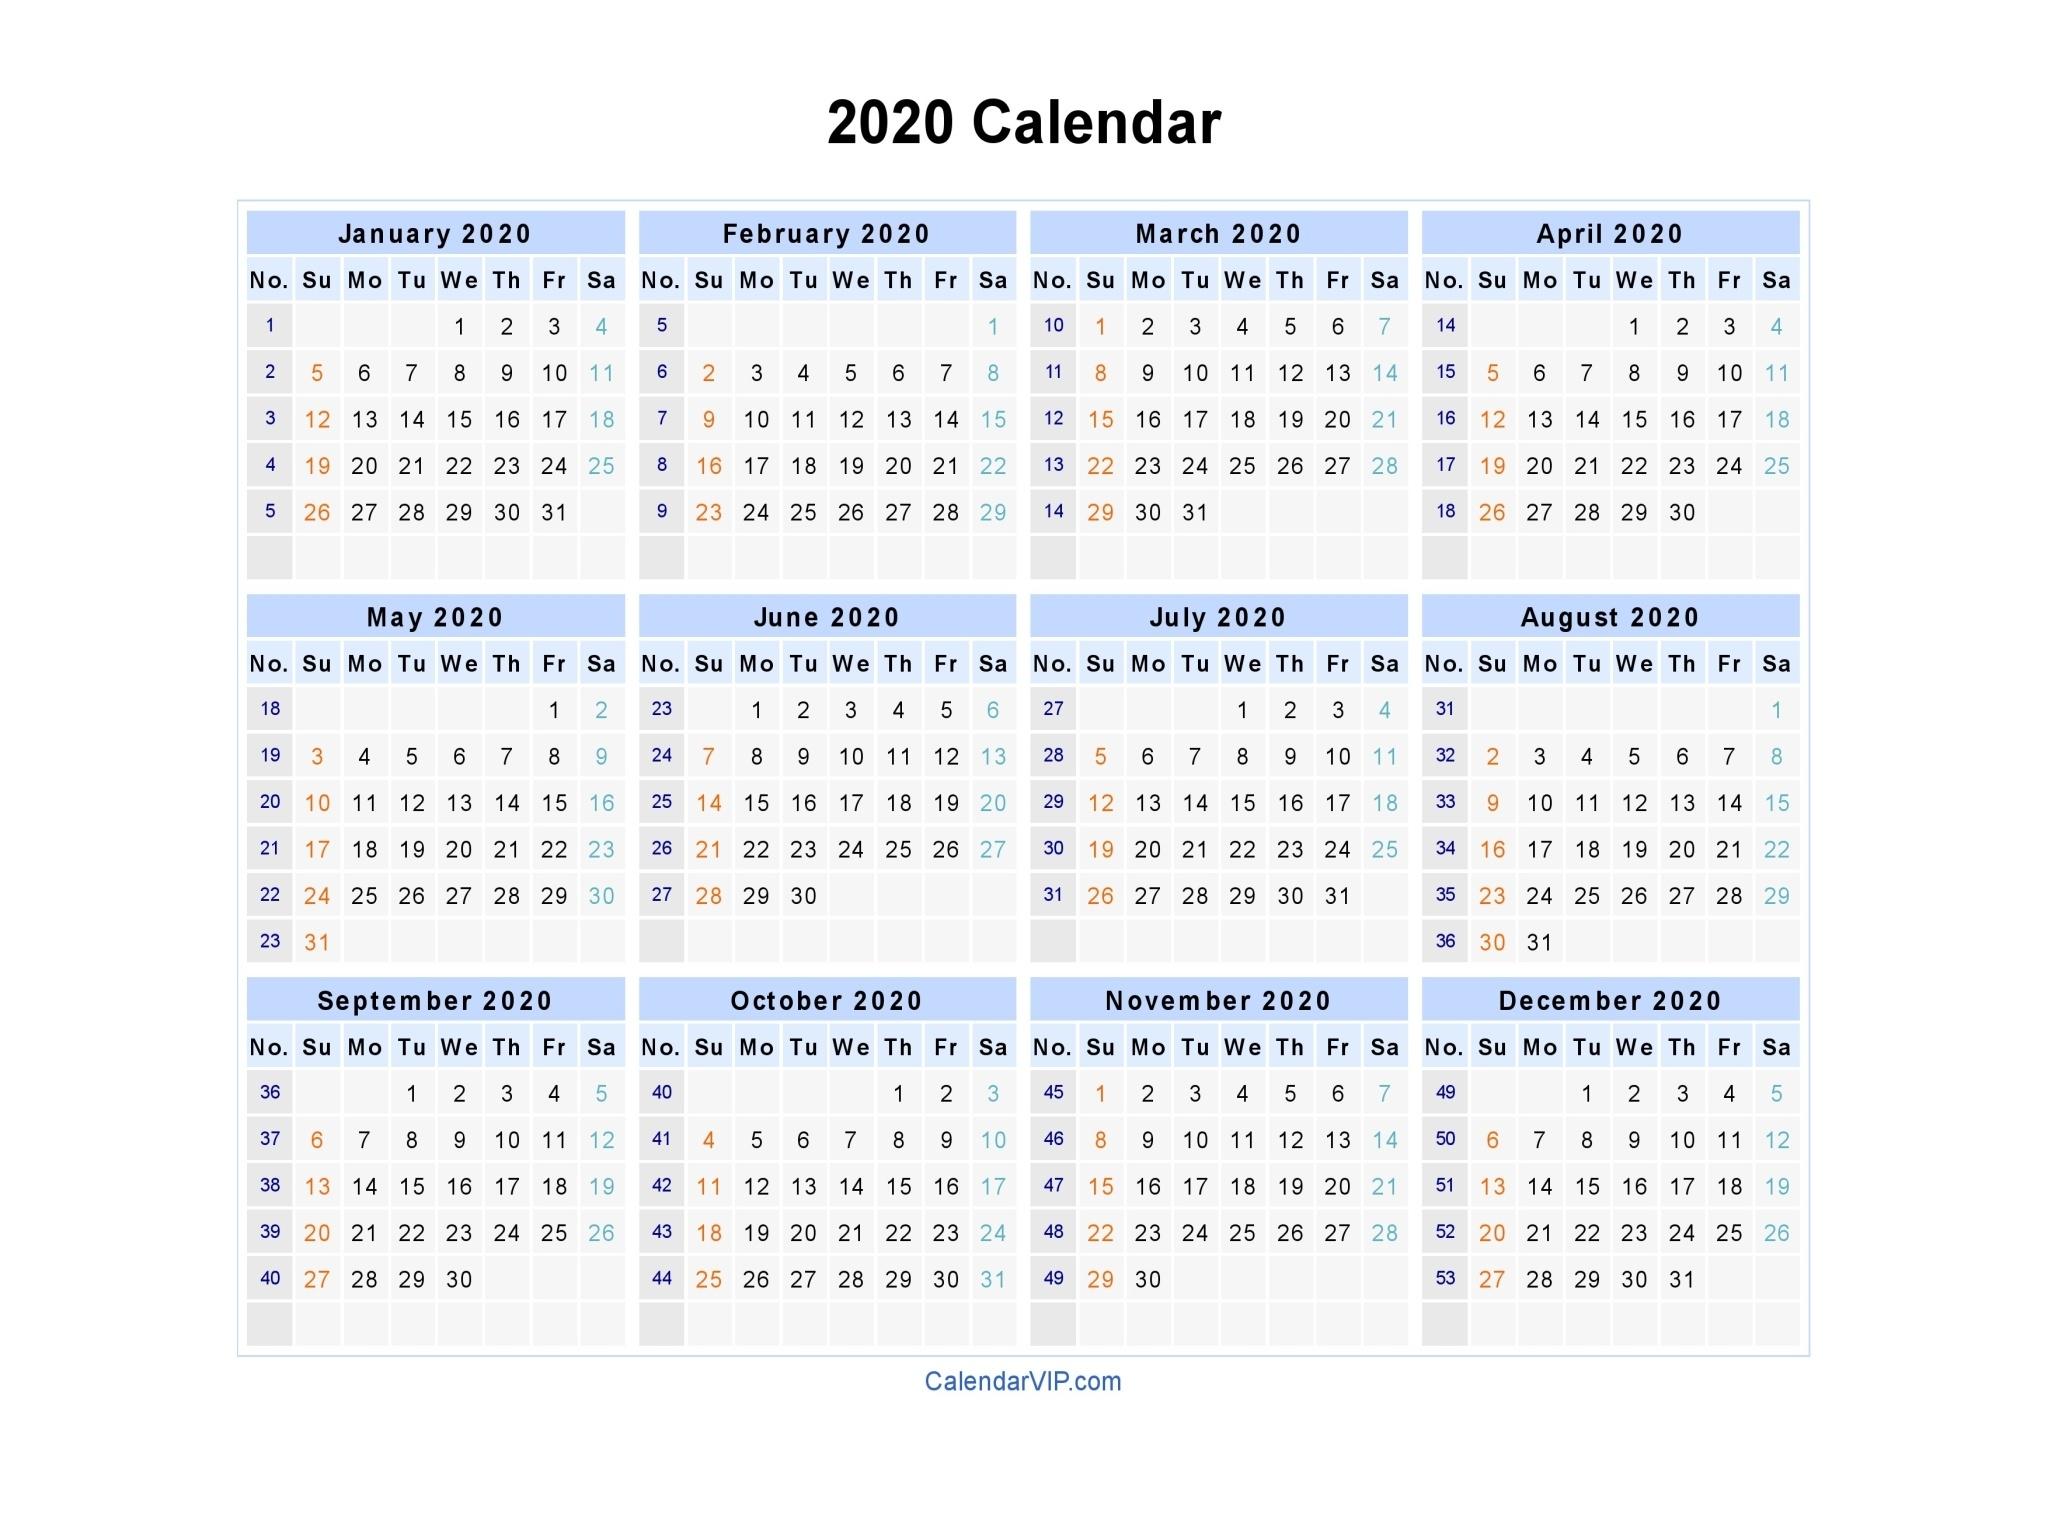 2020 Calendar - Blank Printable Calendar Template In Pdf Word Excel_Blank Horizontal Calendar 2020